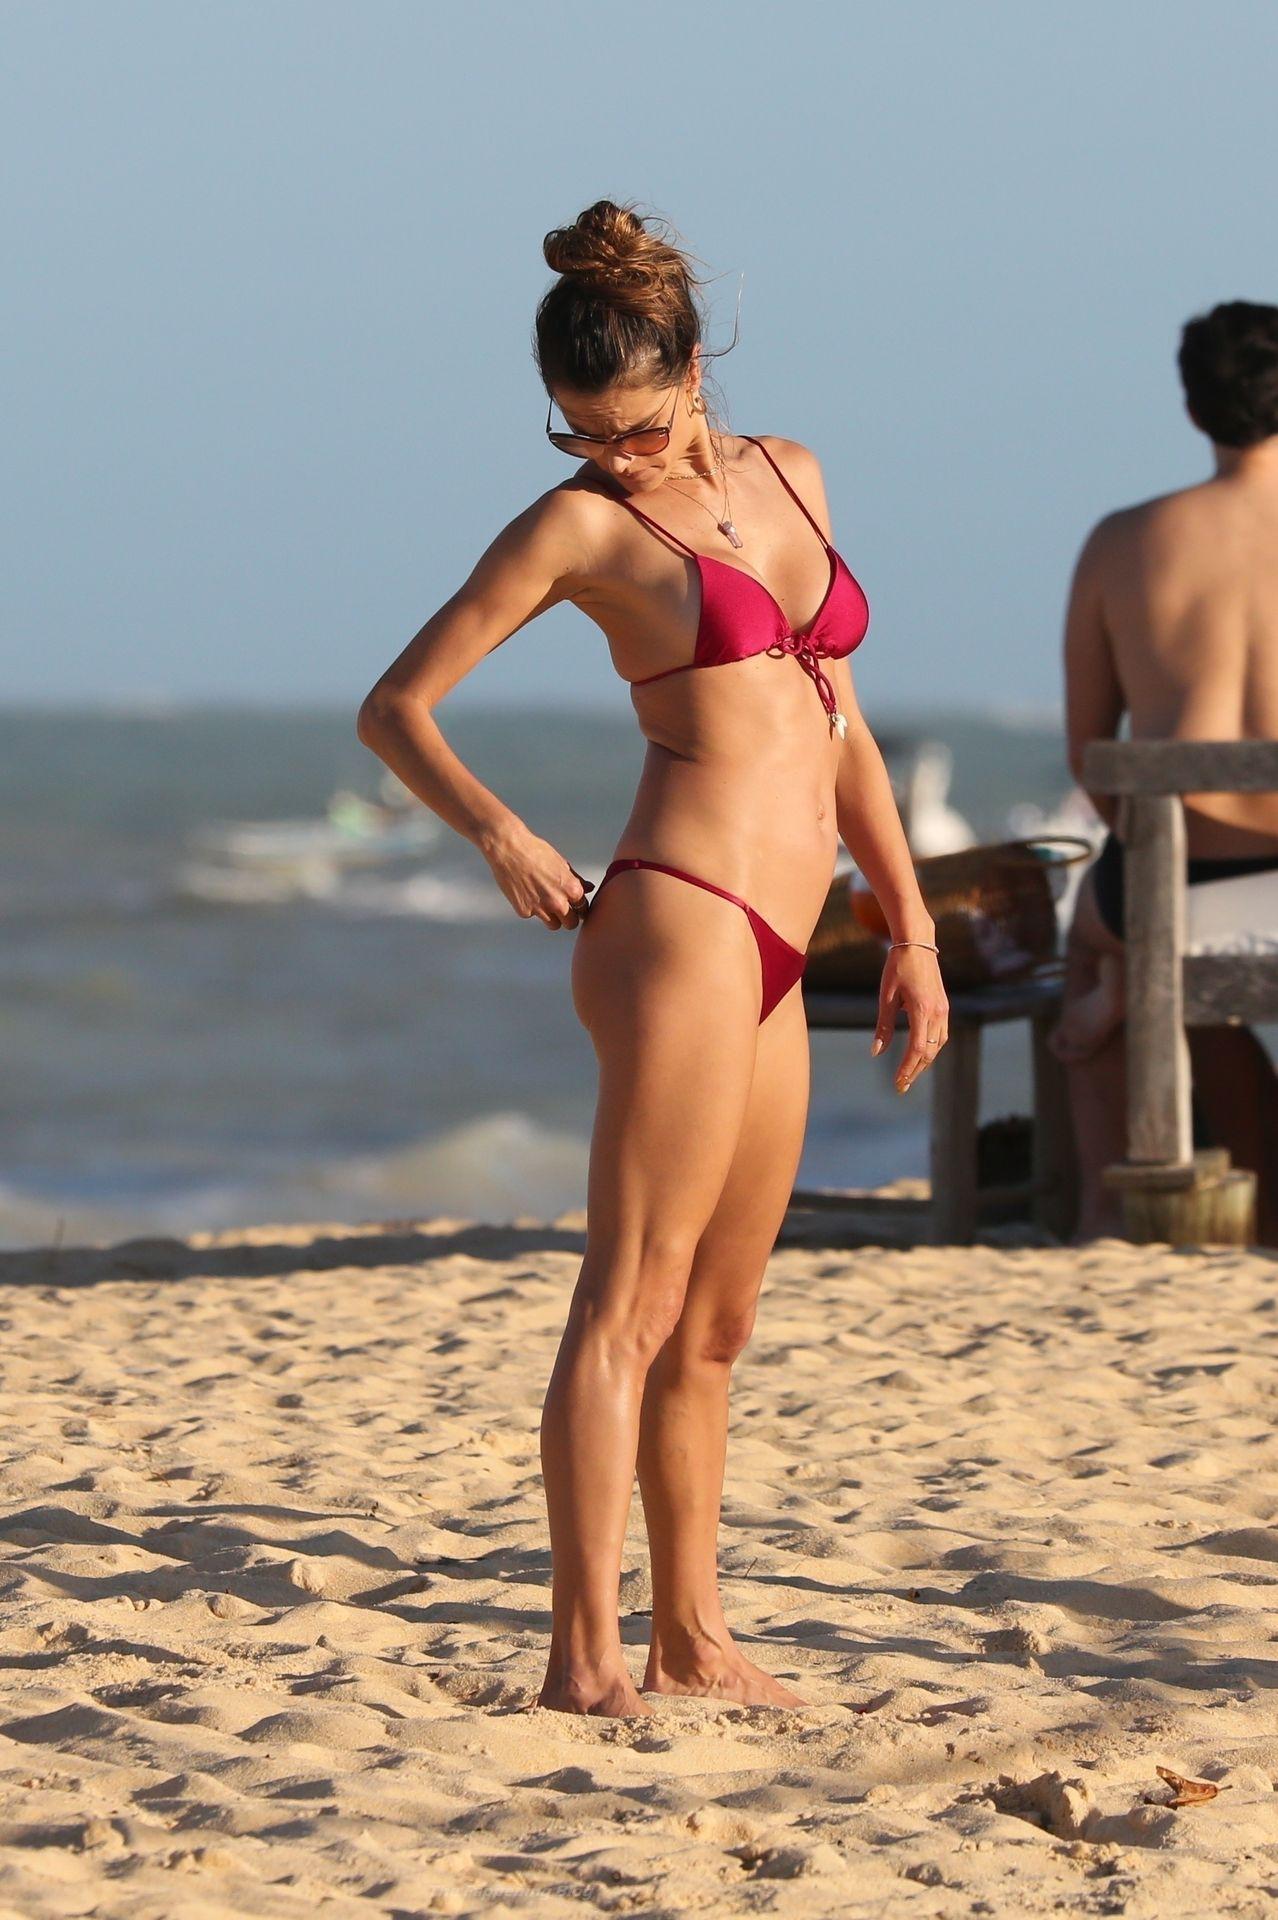 Alessandra-Ambrosio-Sexy-50-thefappeningblog.com_-1.jpg